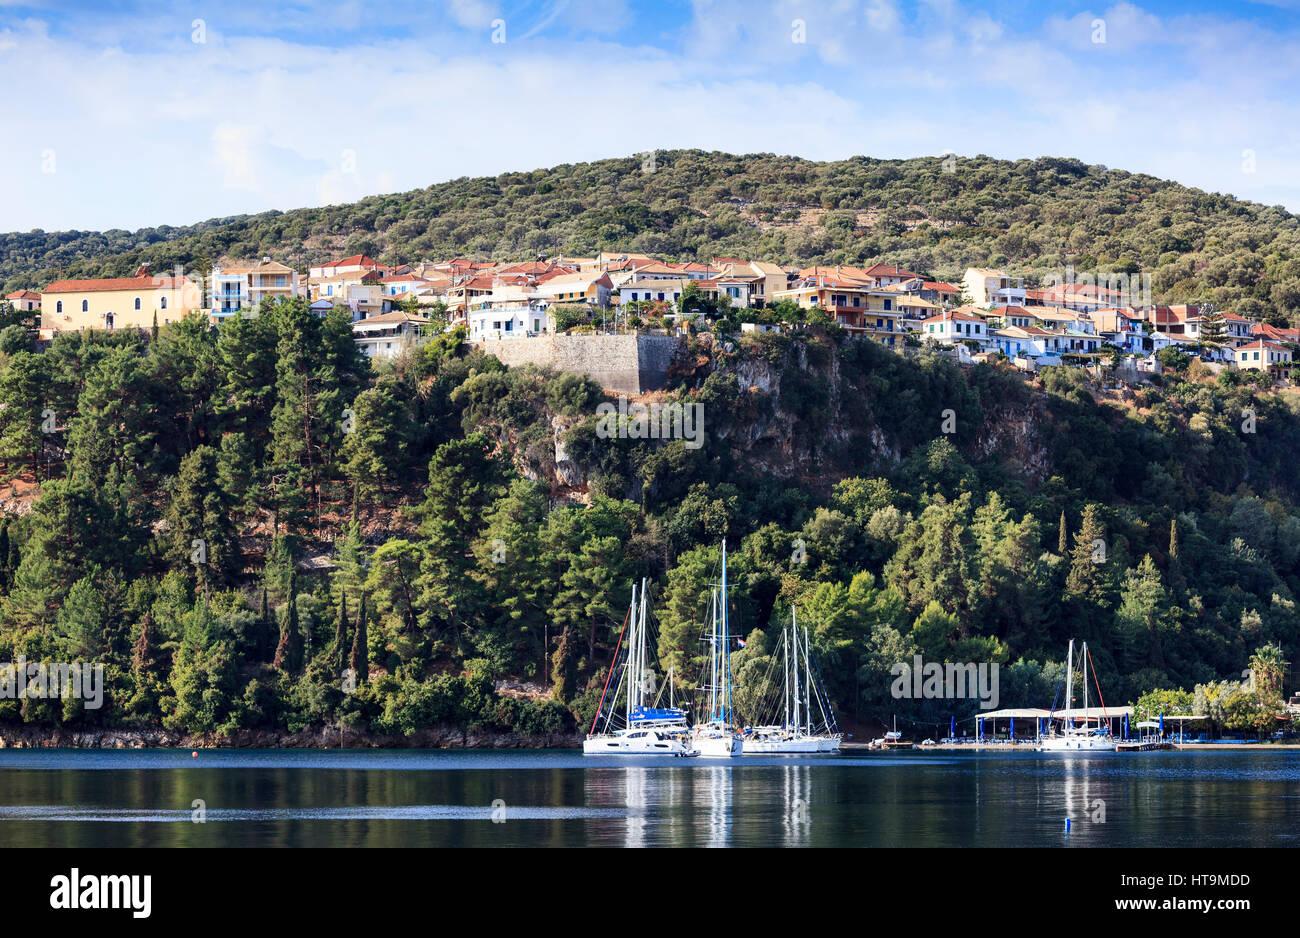 Spartochori, Meganissi, Greece - Stock Image